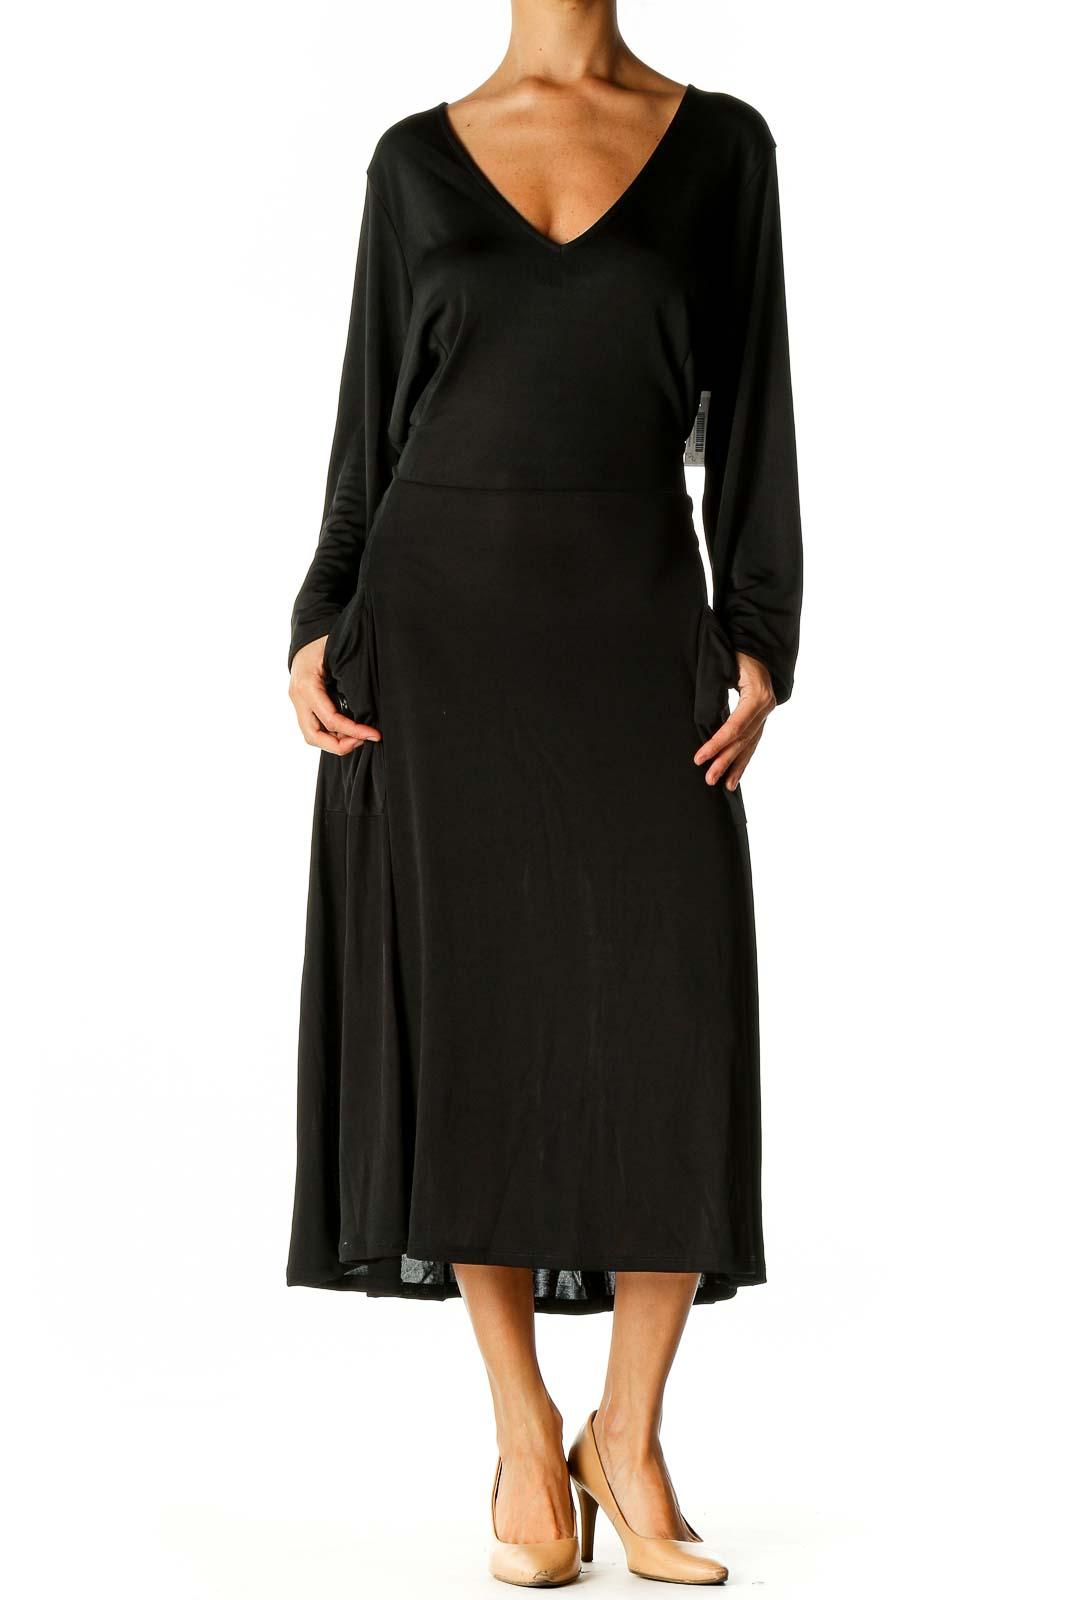 Black Solid Day Column Dress Front